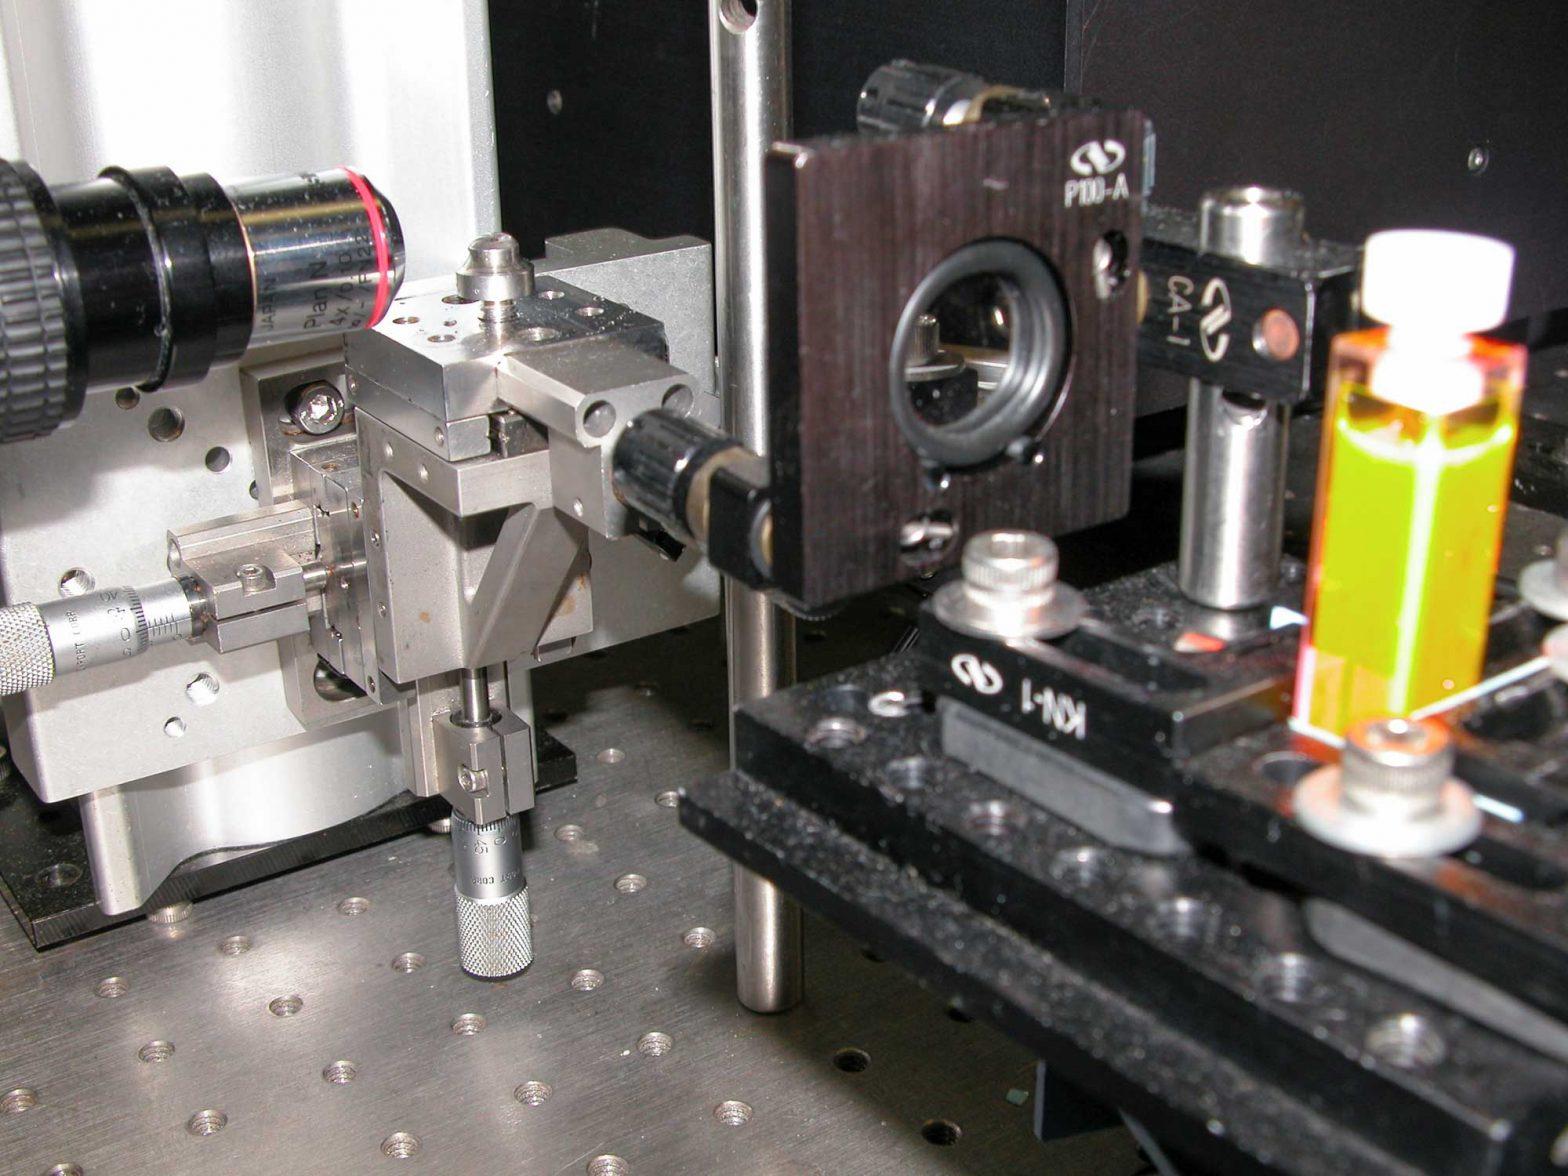 Fast photography setup (closeup) from Fan & Murray, J. Phys. Chem. A. 114 (2010) 1492